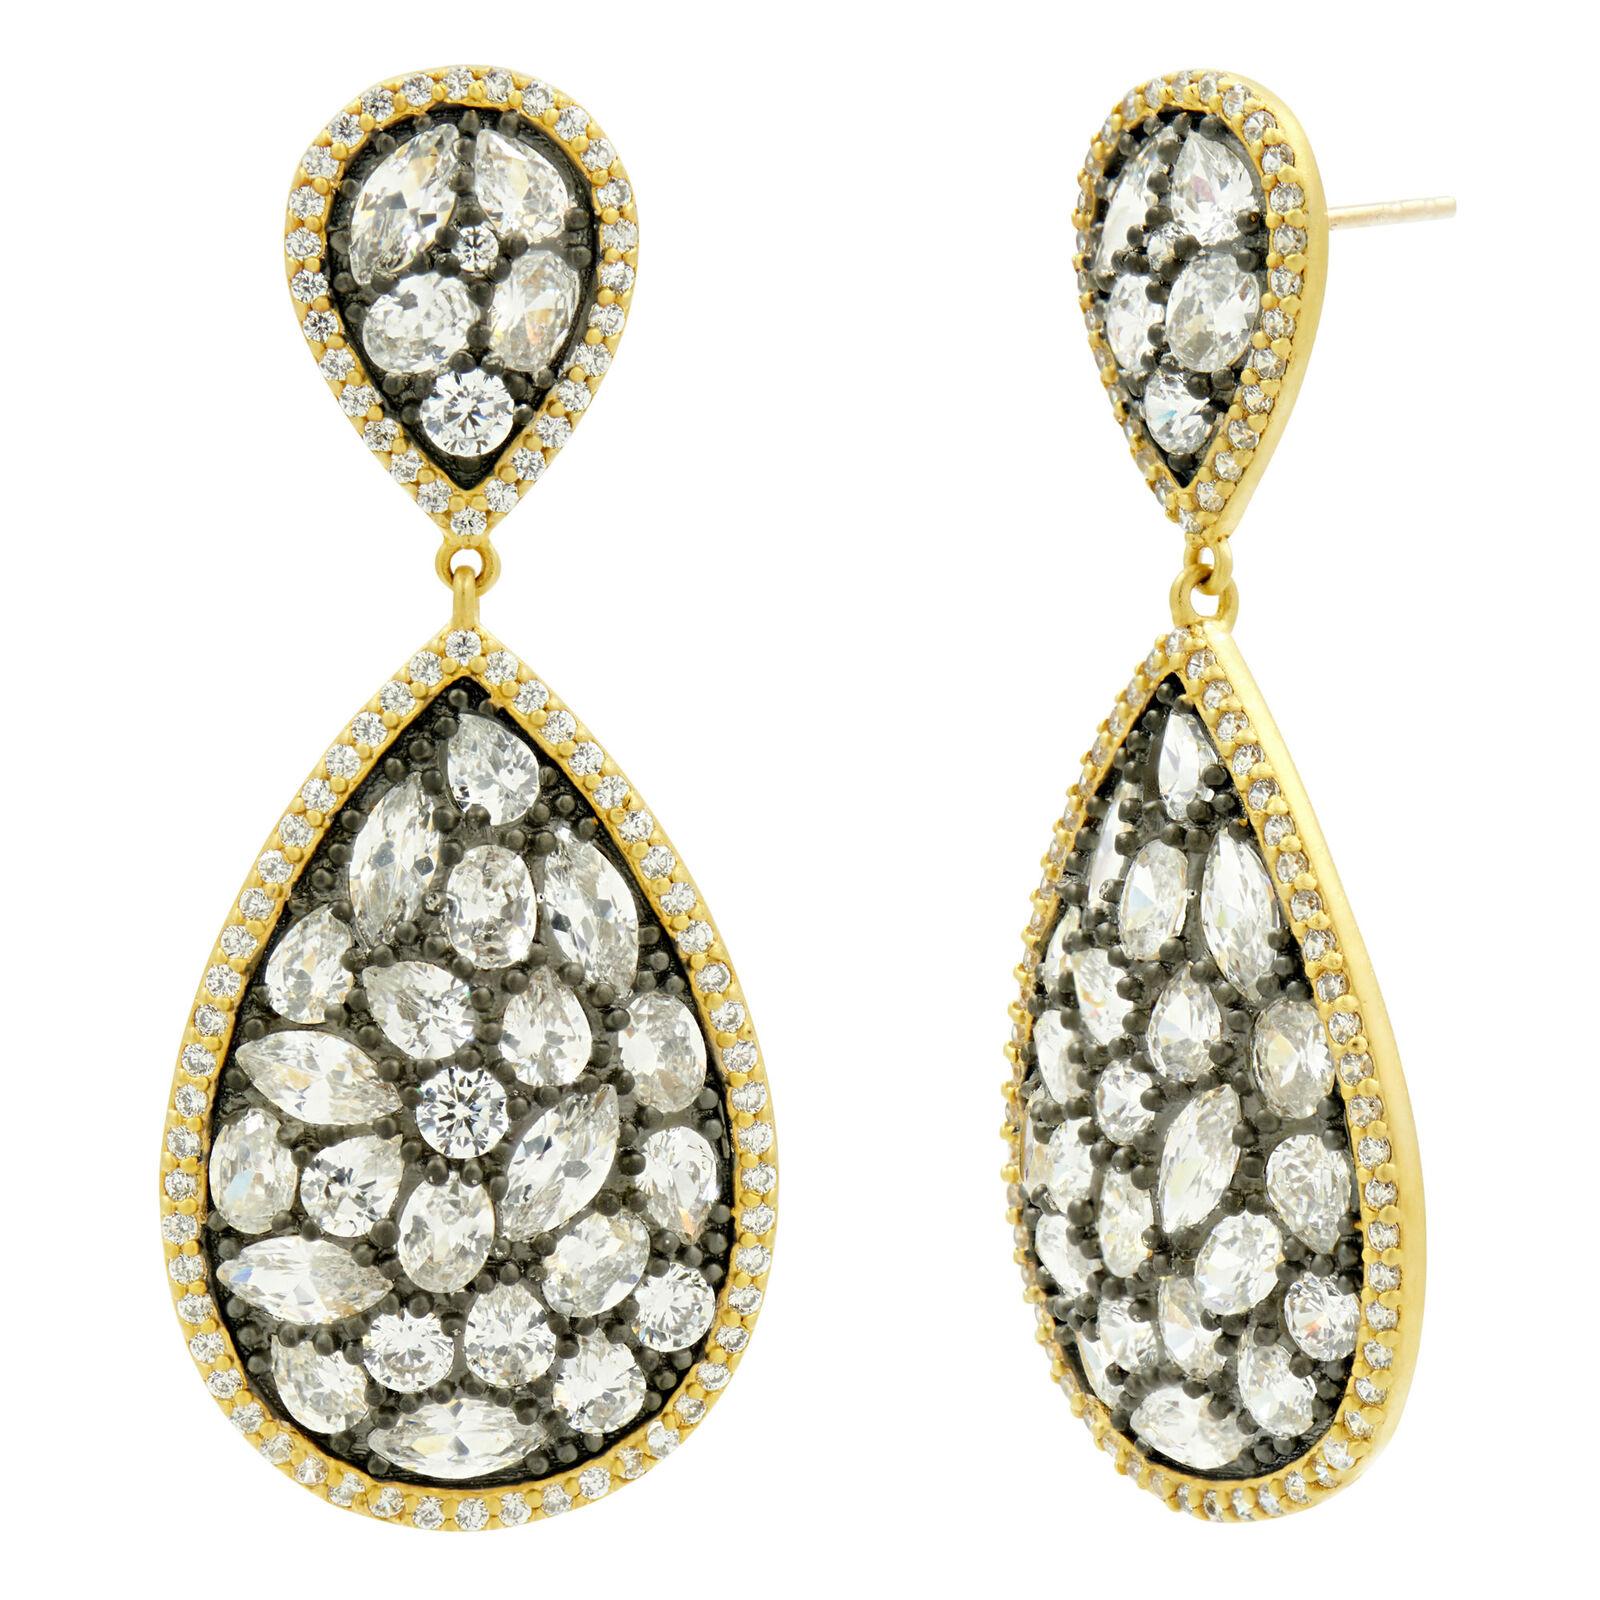 Freida redhman pinkcut Stones Large Drop Earrings - NWT